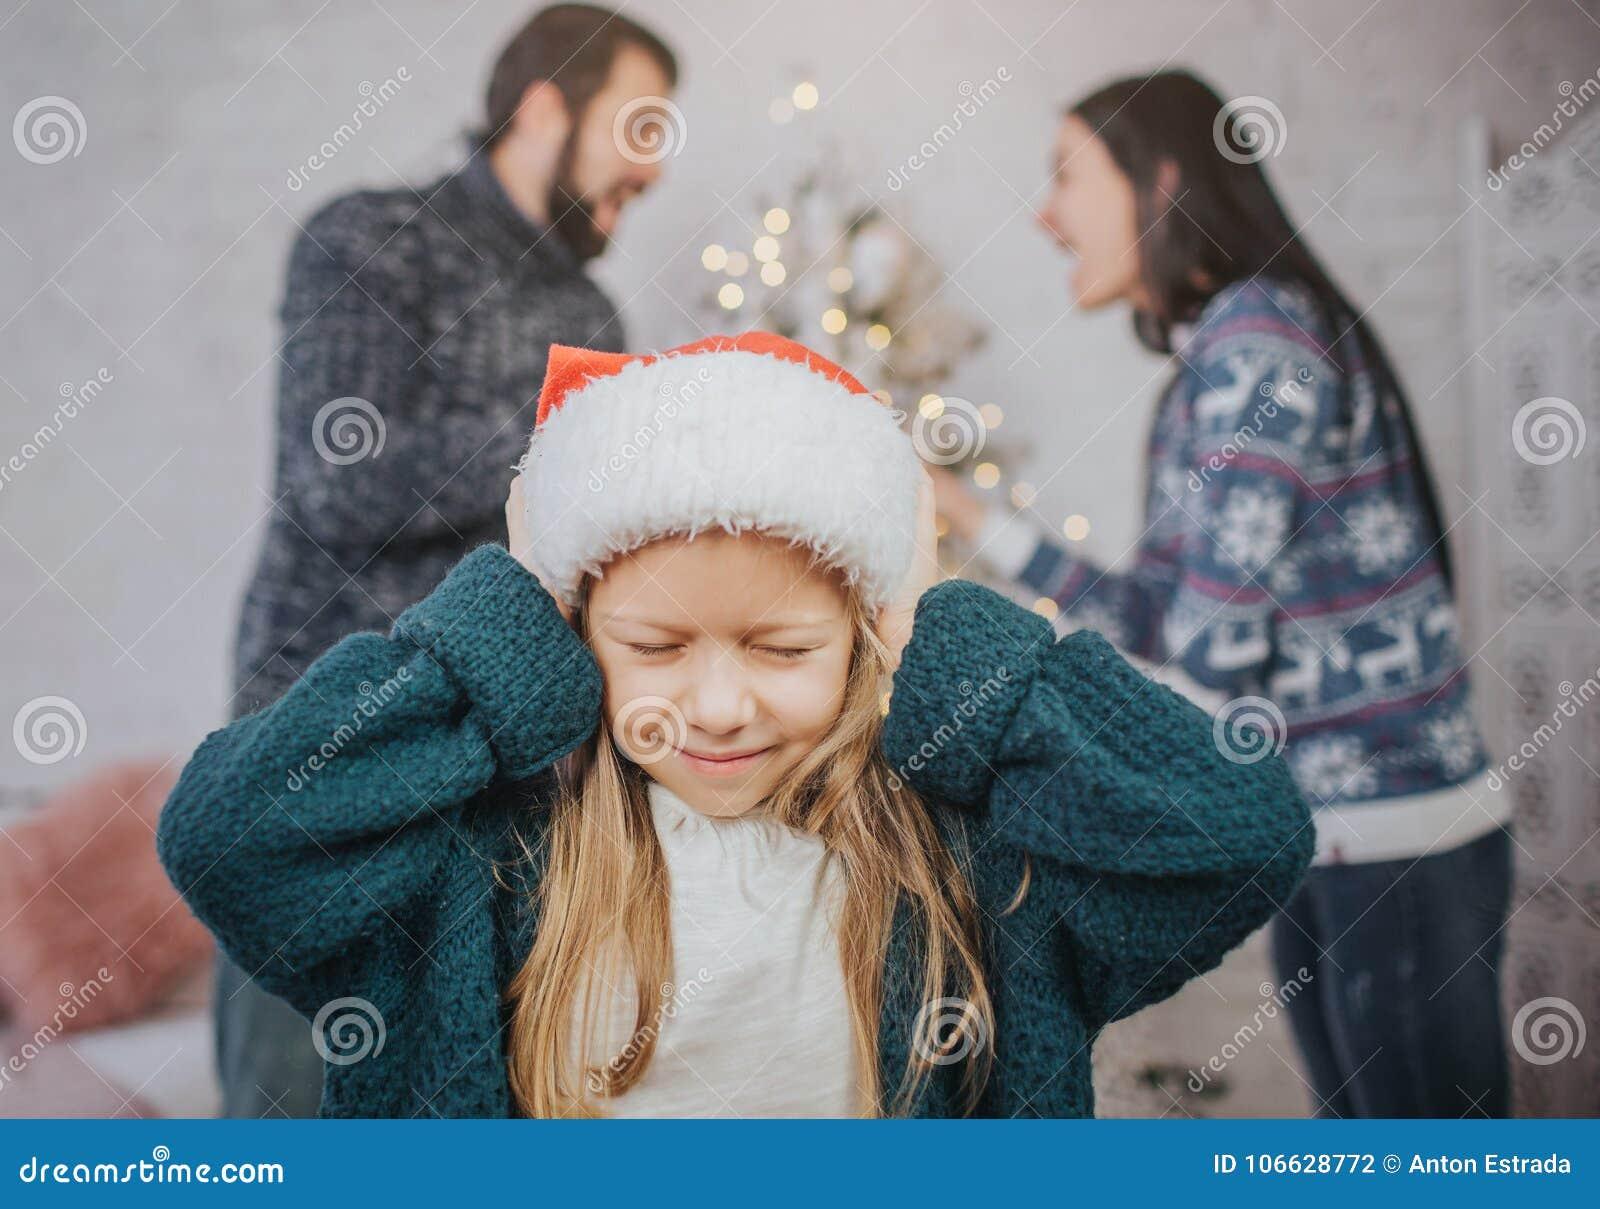 Sad, Desperate Little Girl During Parents Quarrel. Clog The Ears.. Family Quarrel On The Eve Of ...